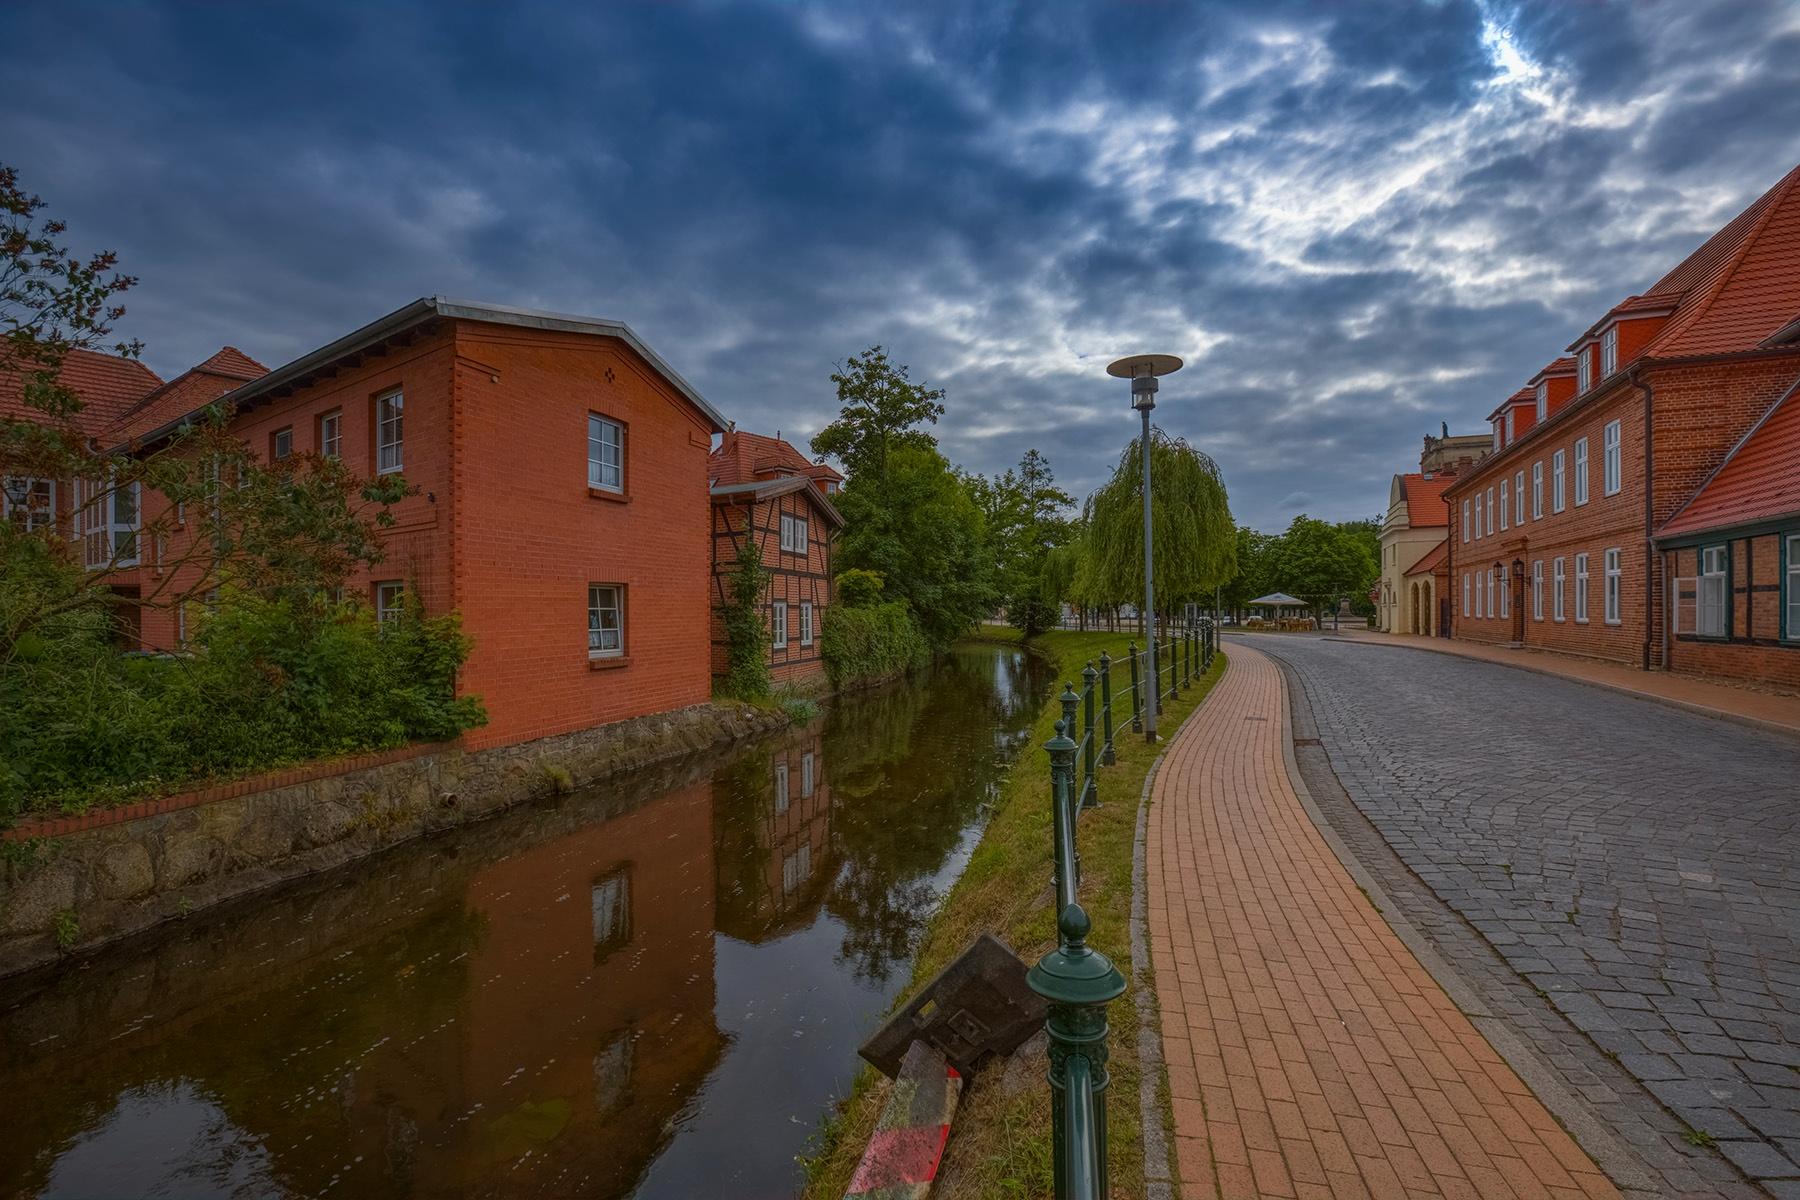 Dunkle Wolken über Ludwigslust by Maik Richter Photography